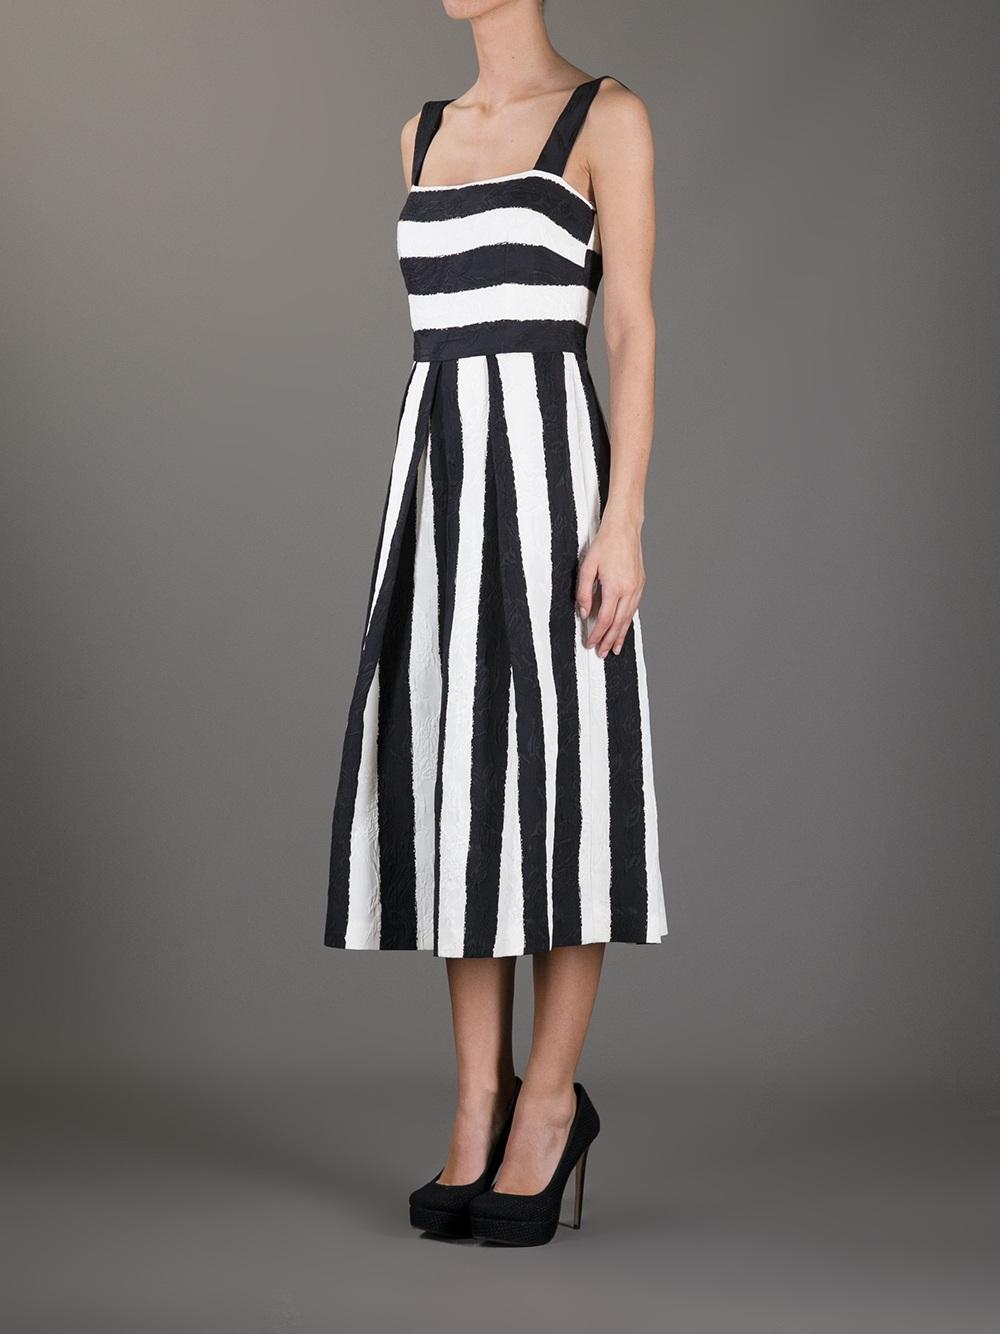 Dolce Amp Gabbana Striped Dress In White Lyst